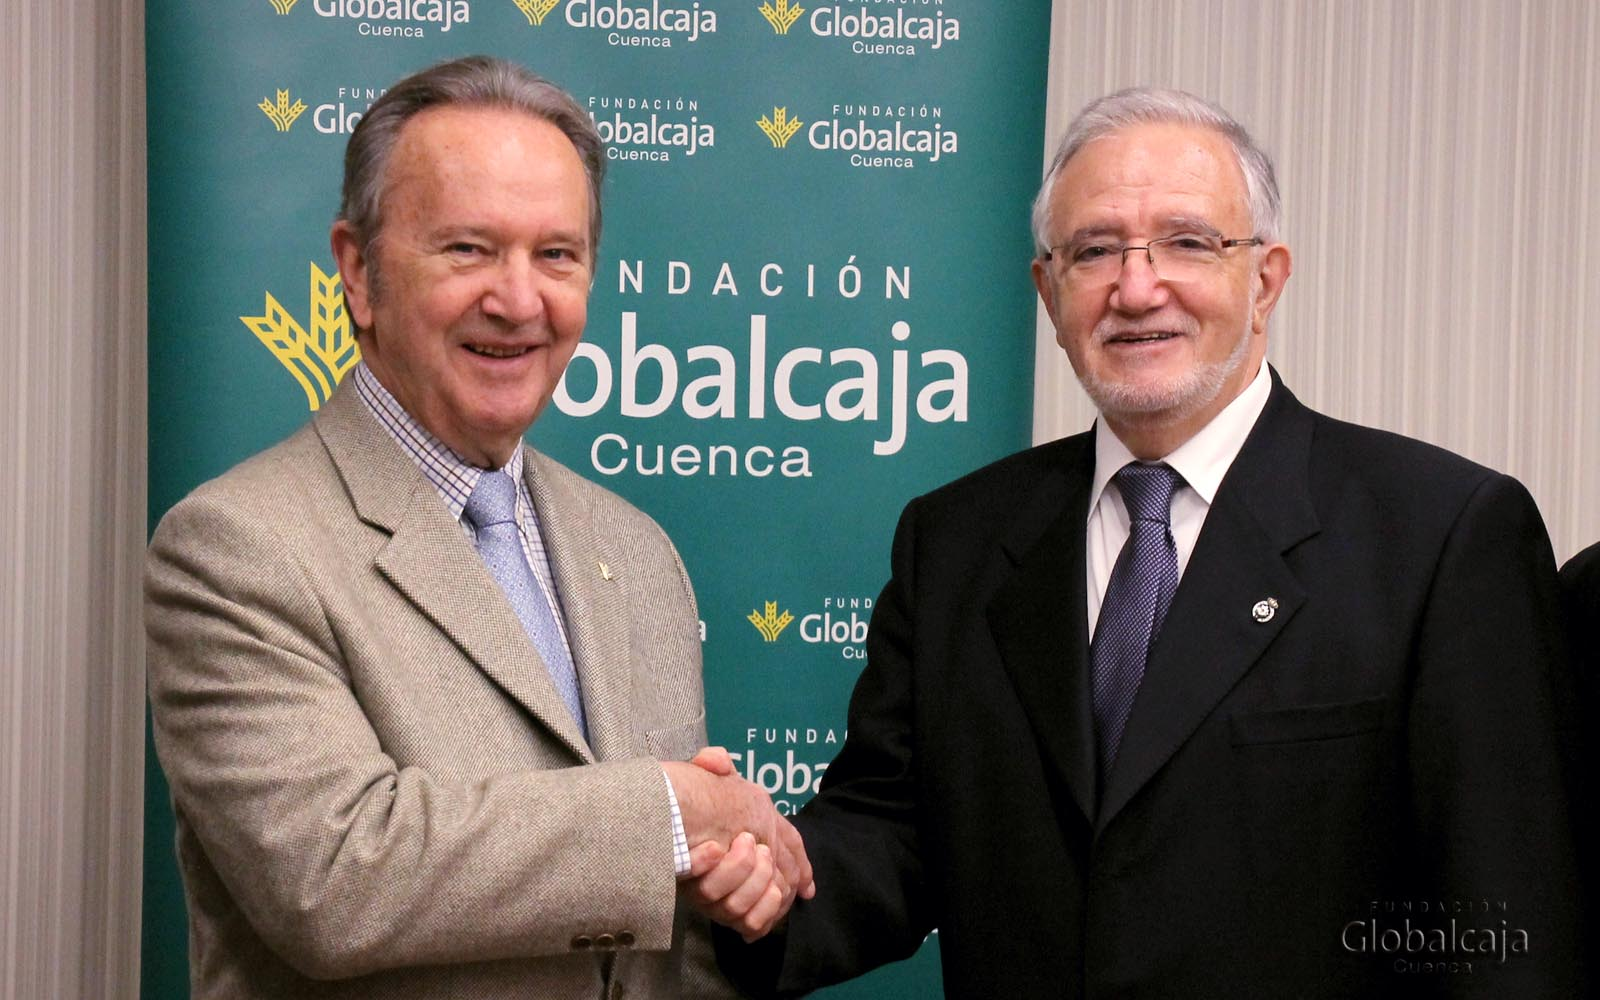 https://blog.globalcaja.es/wp-content/uploads/2015/12/FIRMA-CONVENIO_Cruz-Roja-6_W.jpg